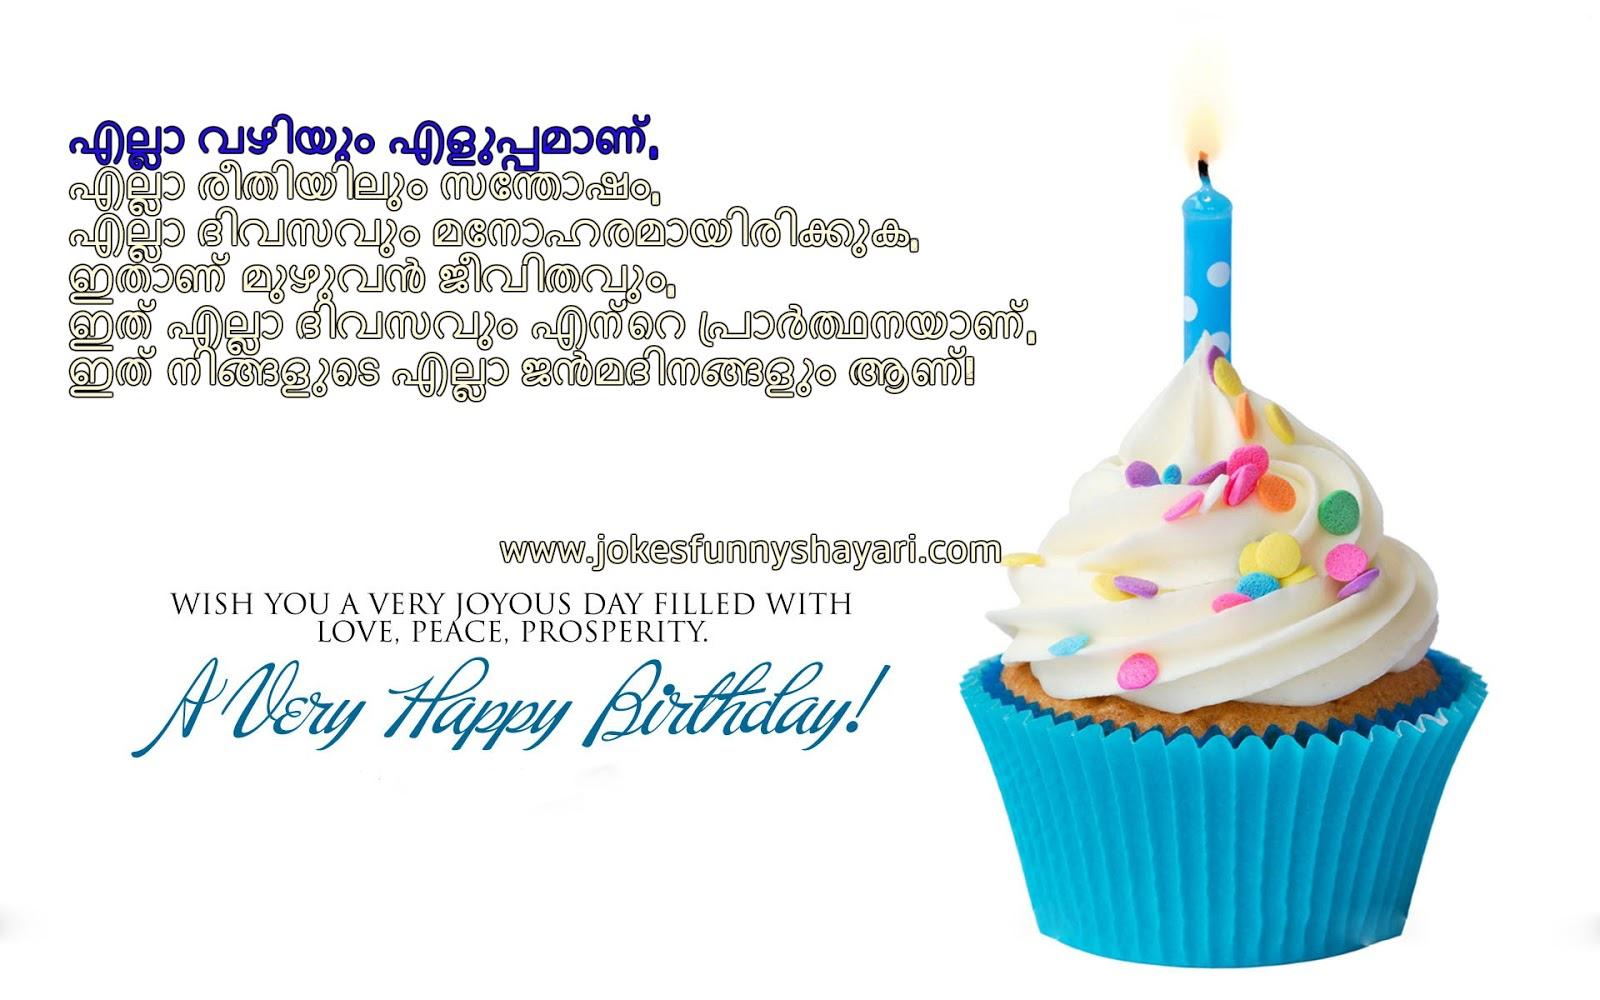 Malayalam Font Happy Birthday Wallpaper